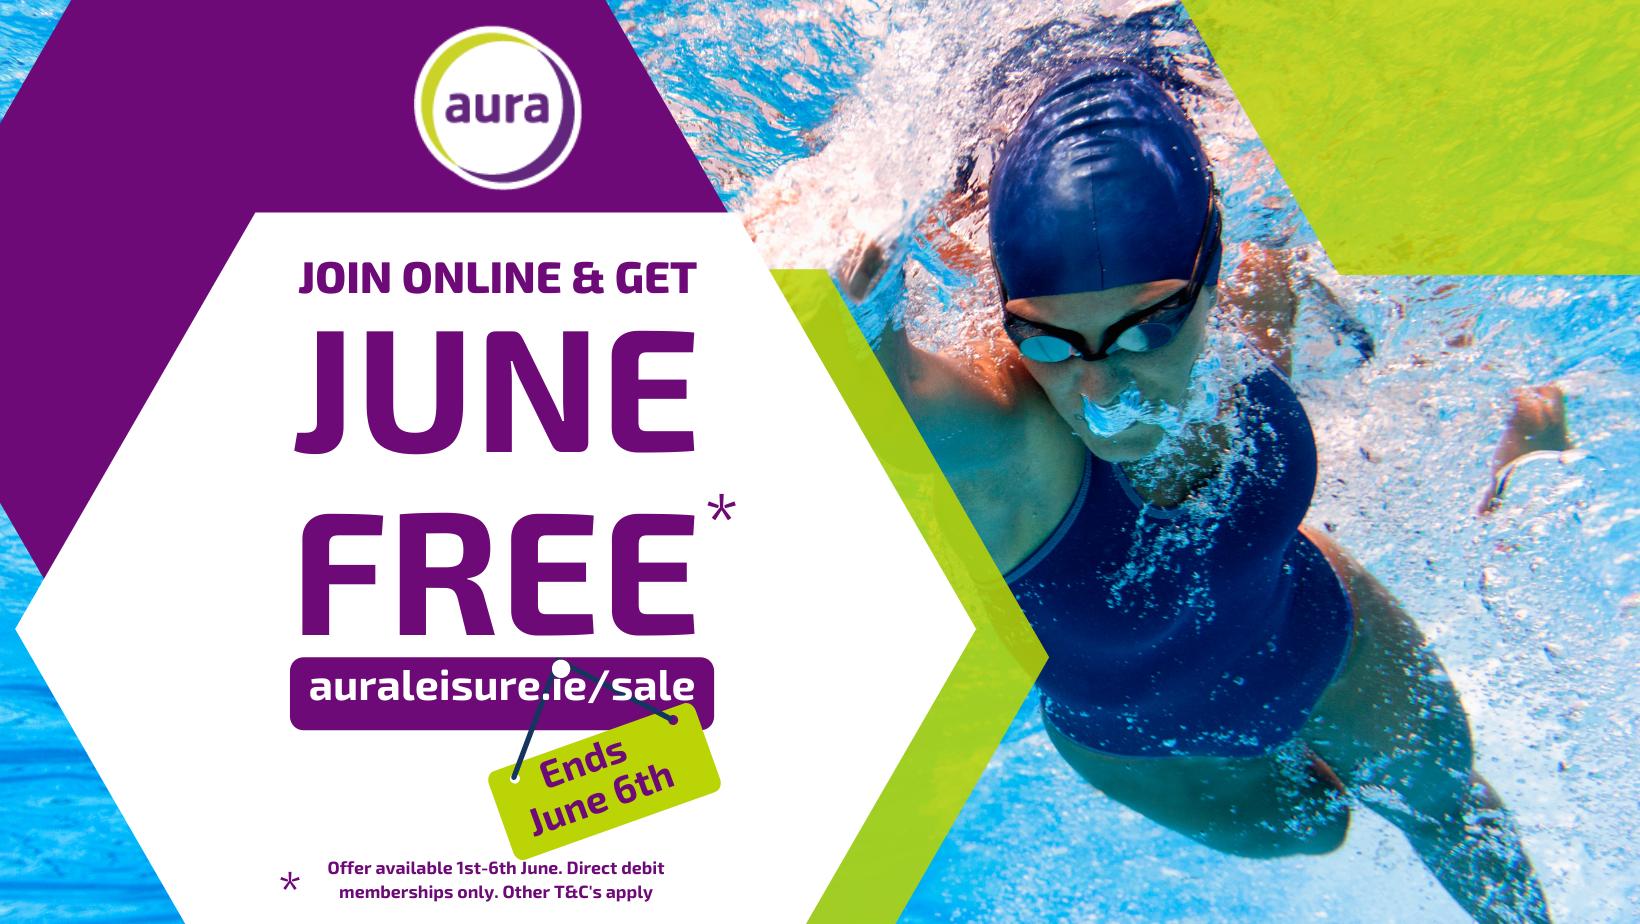 Join Online & Get June Free Special Offer